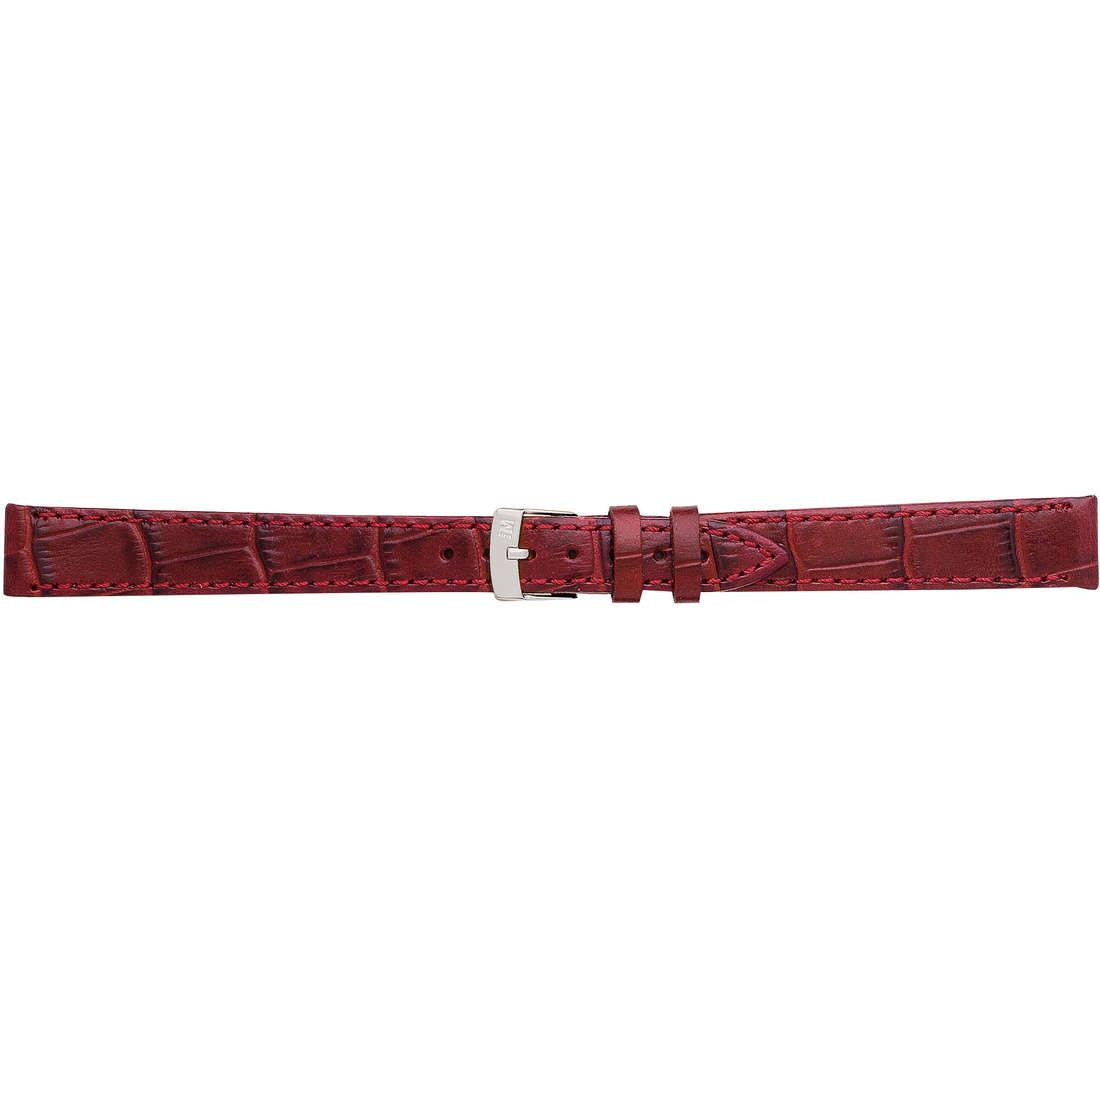 watch watch bands watch straps unisex Morellato I Lunghi A01Y2524656081CR16